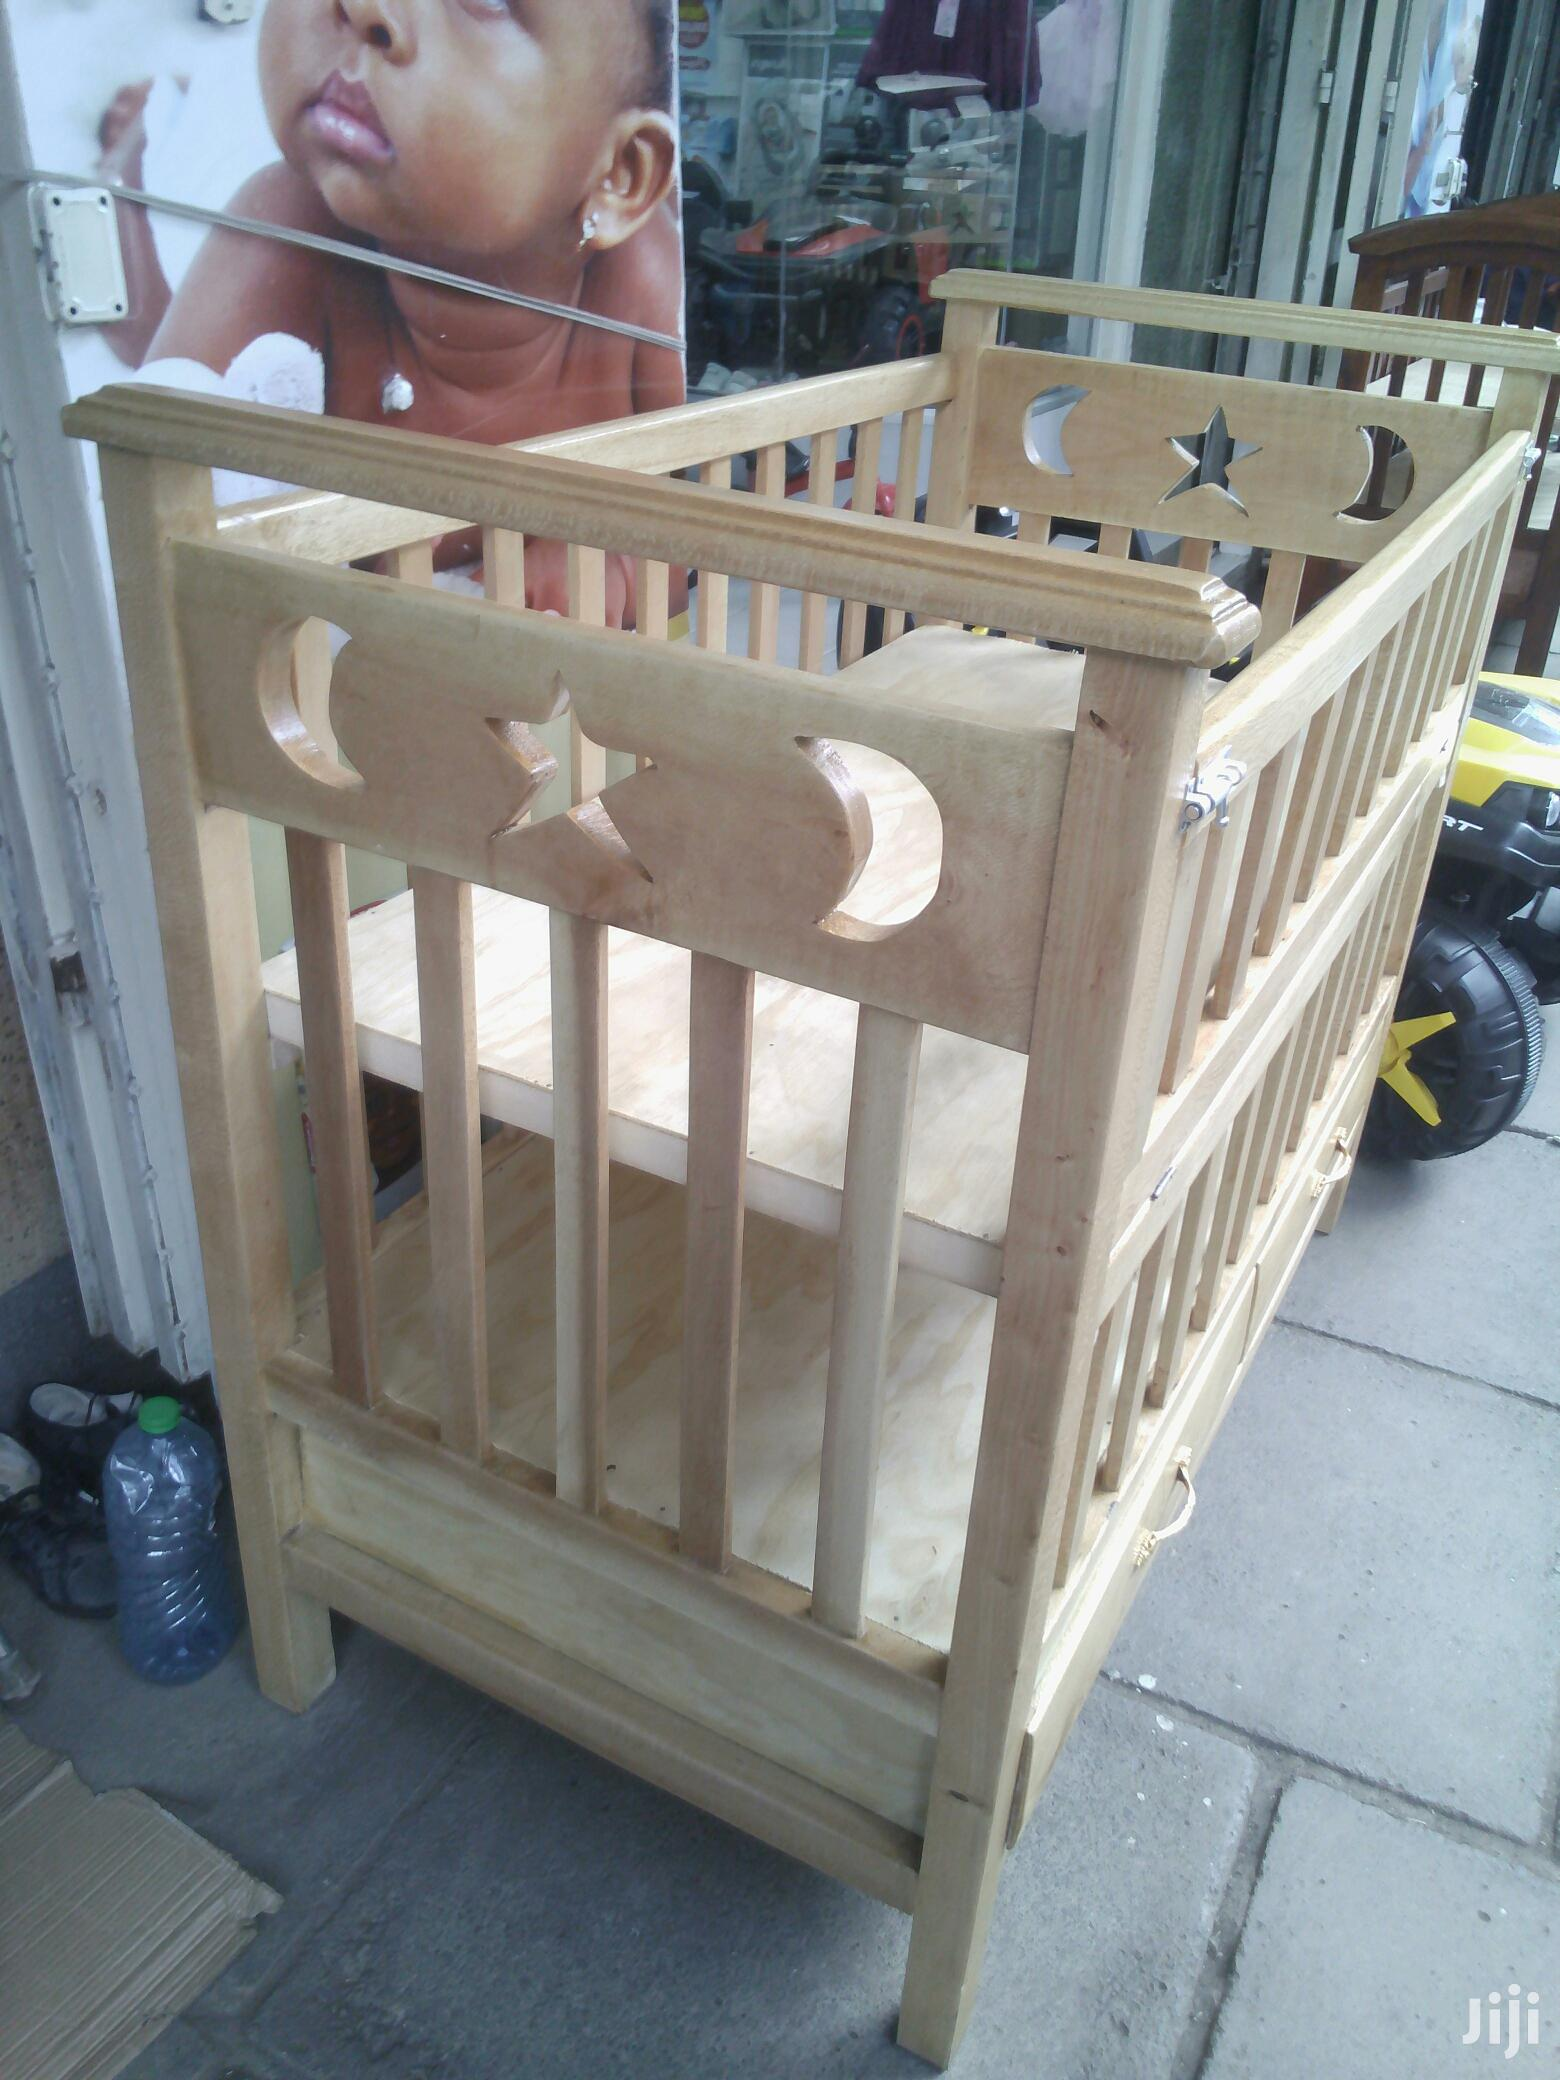 Wooden Baby Cot | Children's Furniture for sale in Nairobi Central, Nairobi, Kenya